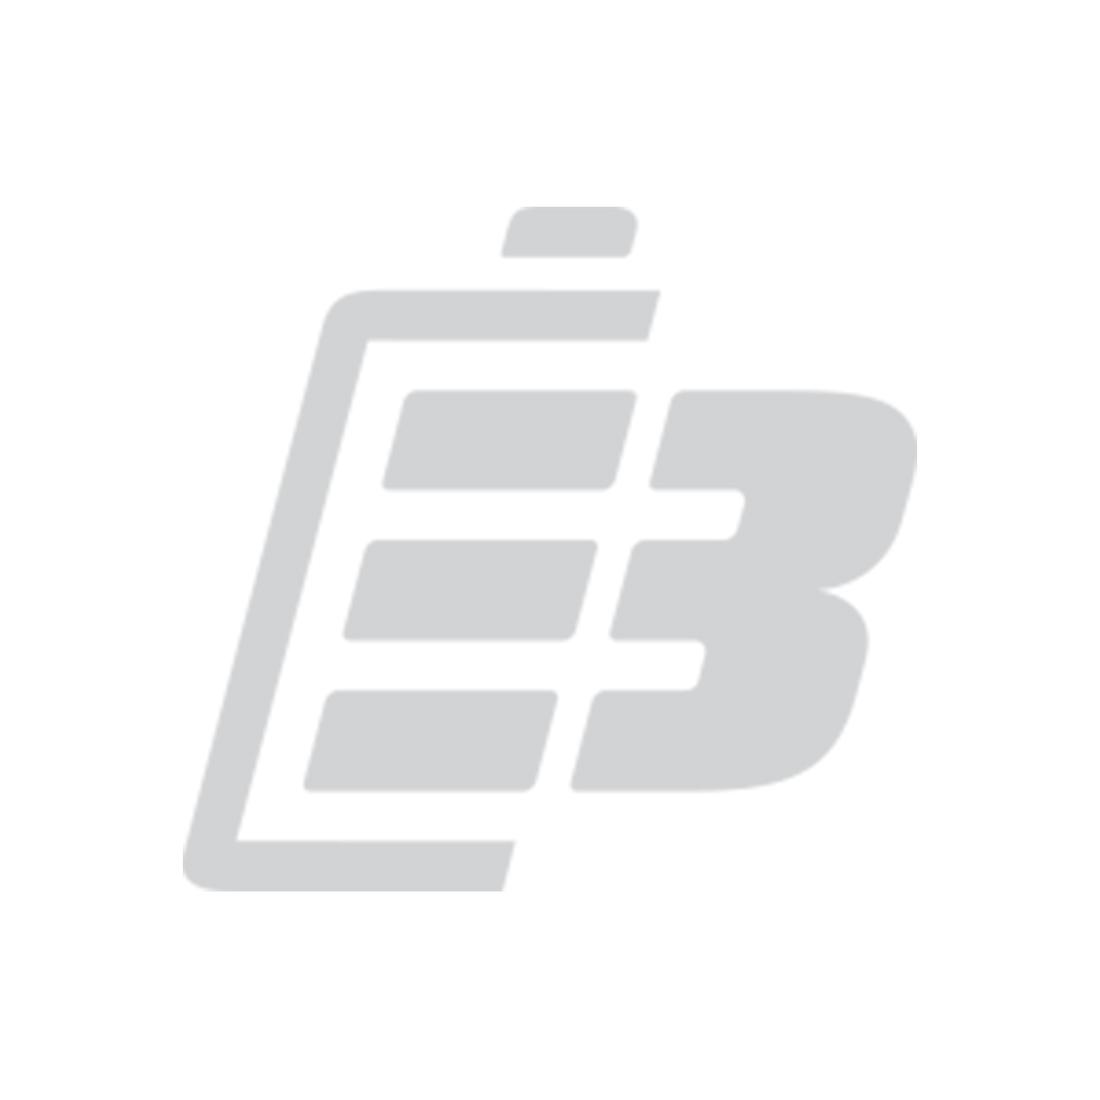 Cordless phone battery Siemens Gigaset 4000 Micro_1